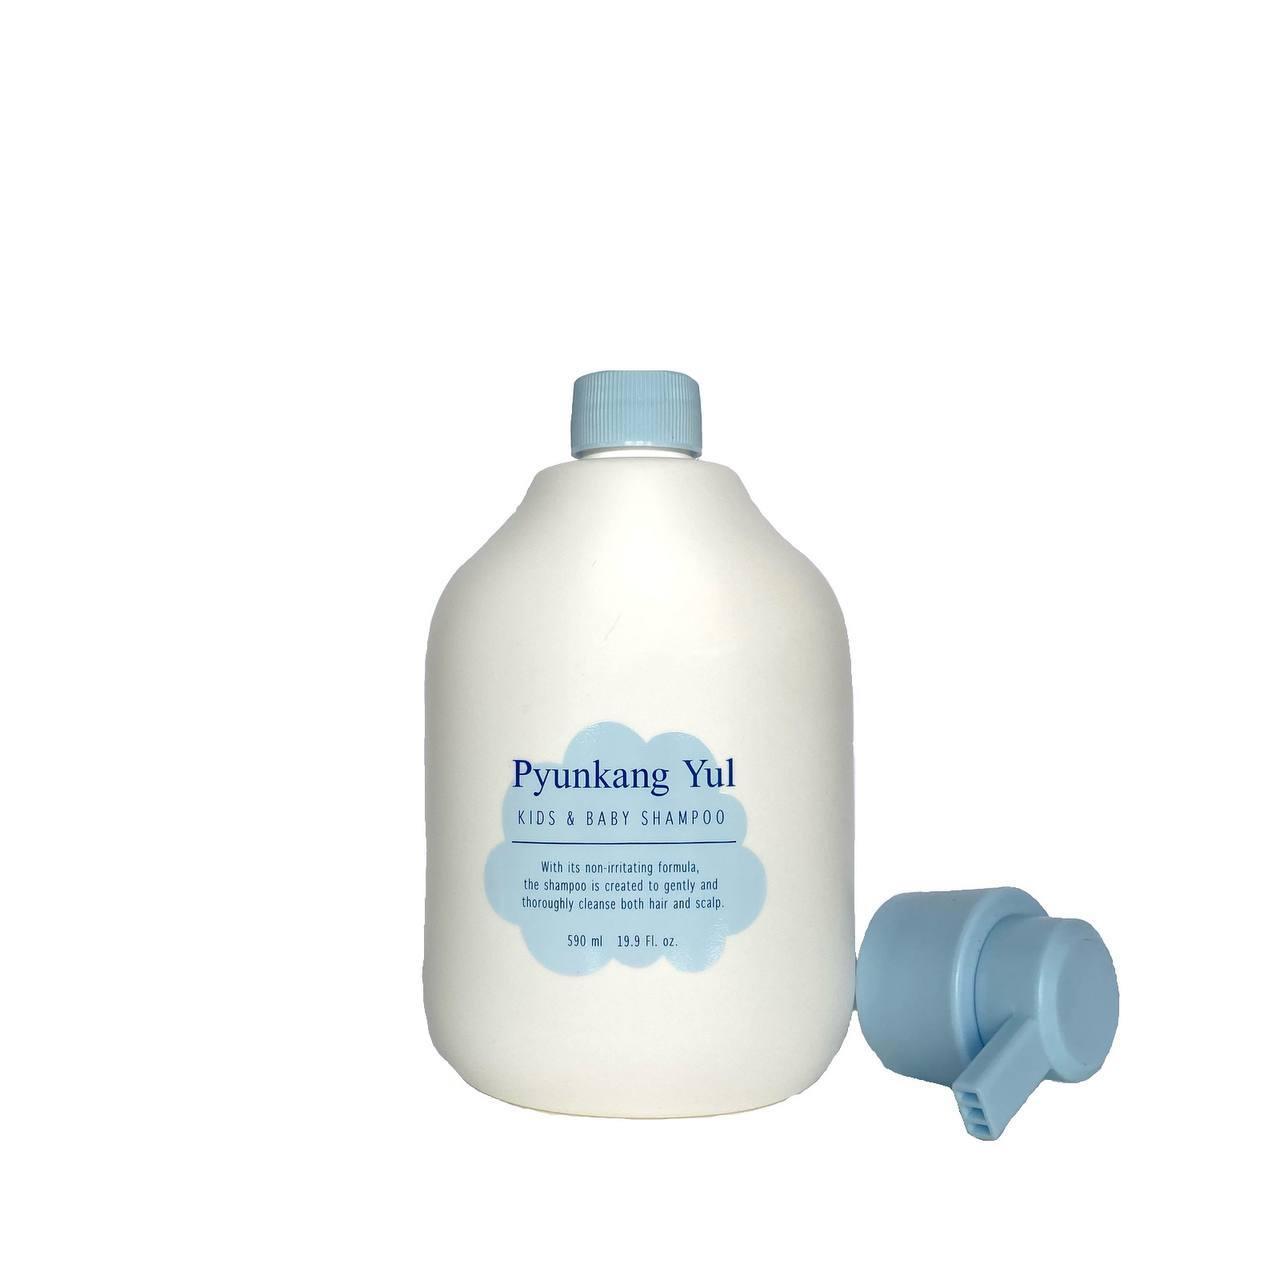 Шампунь детский Pyunkang Yul Kids & Baby Shampoo 590 мл